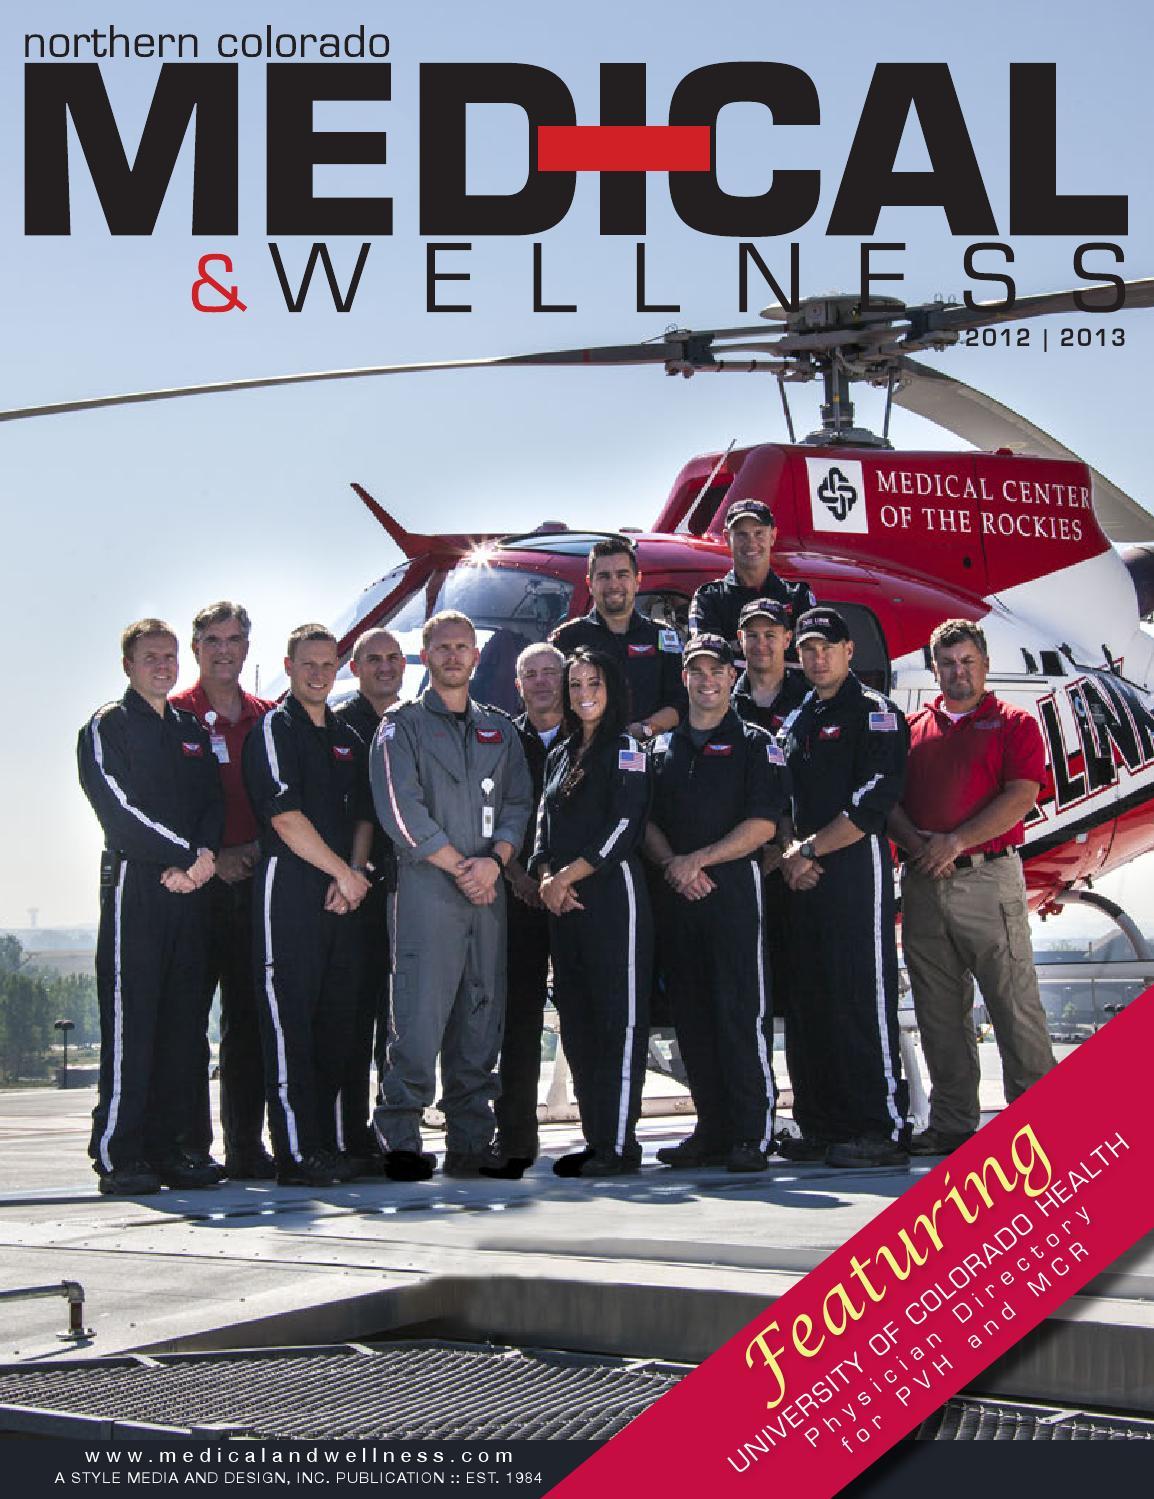 2012-07 Northern Colorado Medical & Wellness Magazine and